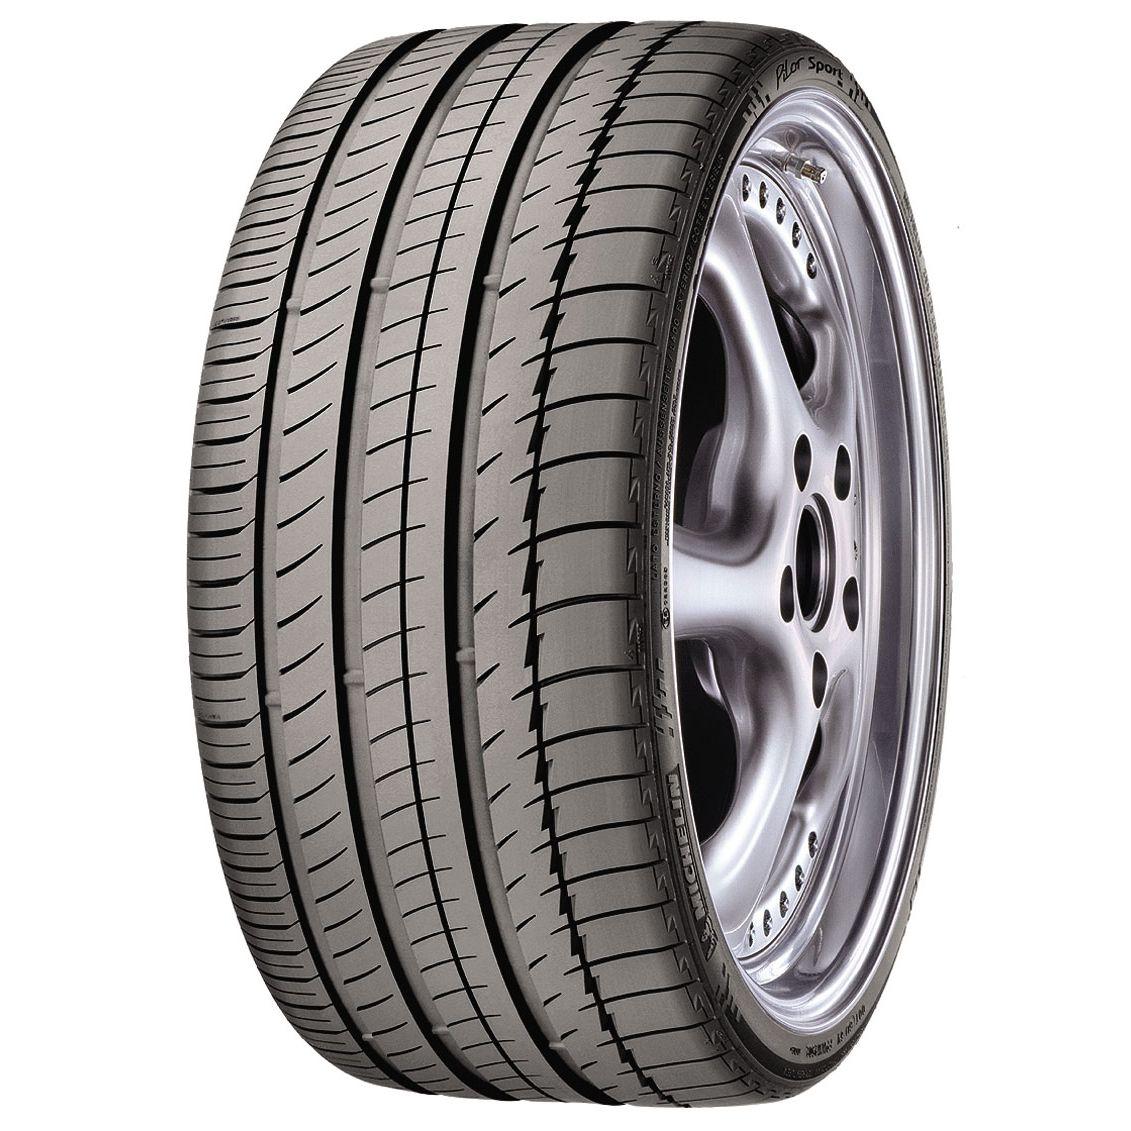 Anvelope Michelin Pilot Sport Ps2 315/30R18 98Y Vara